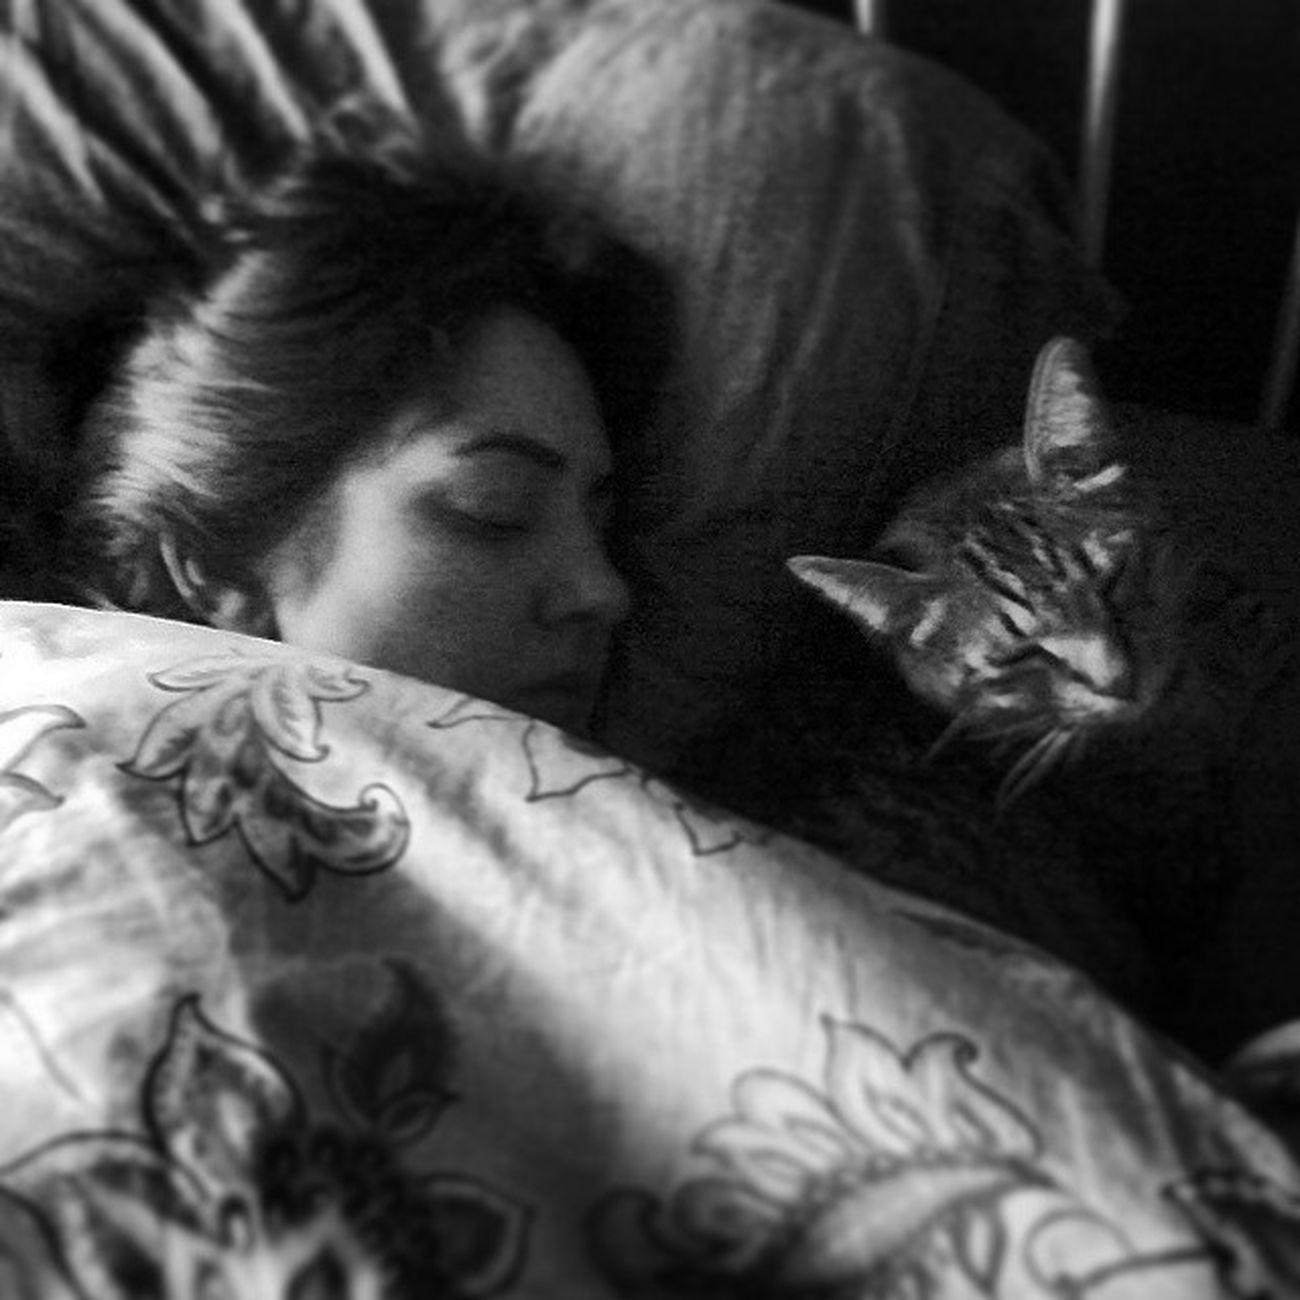 Lazysunday with my favorite Sleepingbuddy . Leadingalifeofleisure Sleep hollygolightly breakfastattiffanys cat 😽 // 📷 @peteryuskauskas